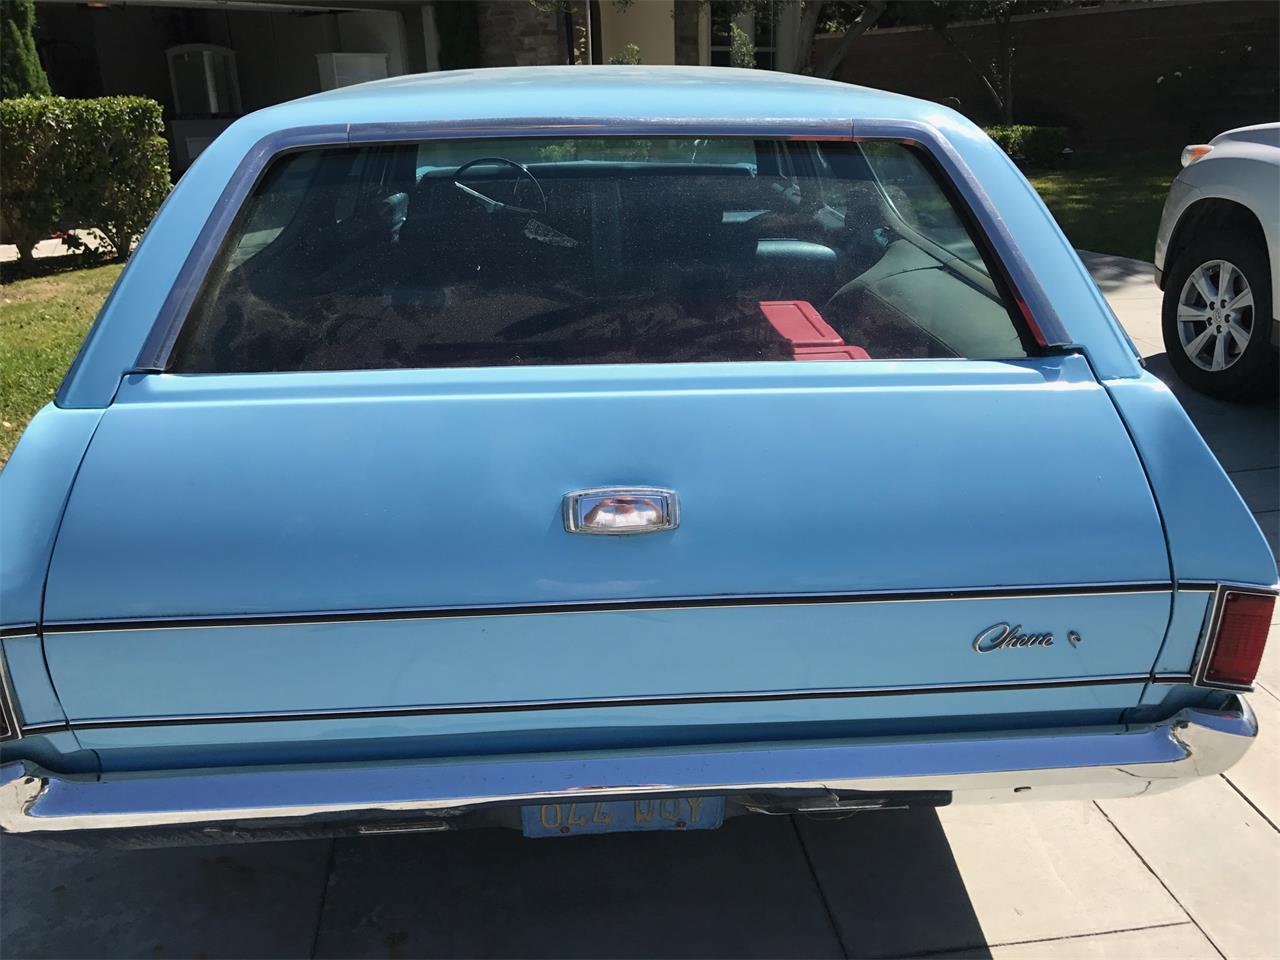 Large Picture of Classic '68 Chevrolet Malibu located in Irvine California - $6,000.00 - LF5W